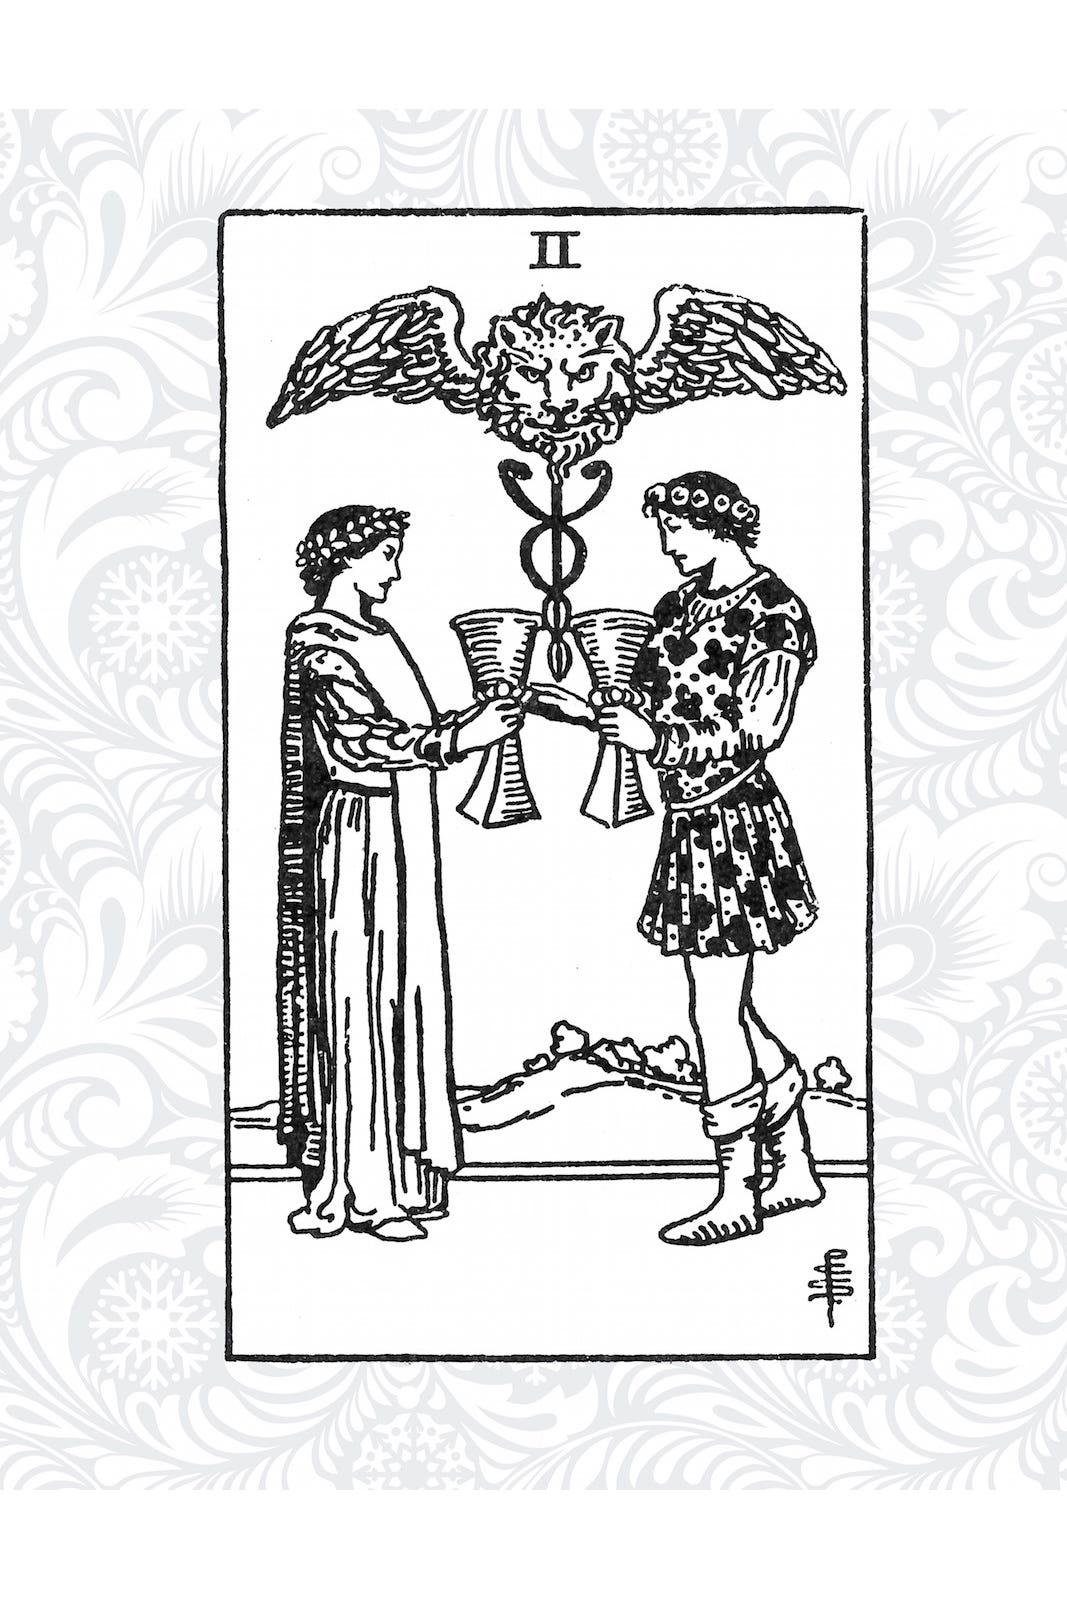 Tarot Card Reading Prediction For Year